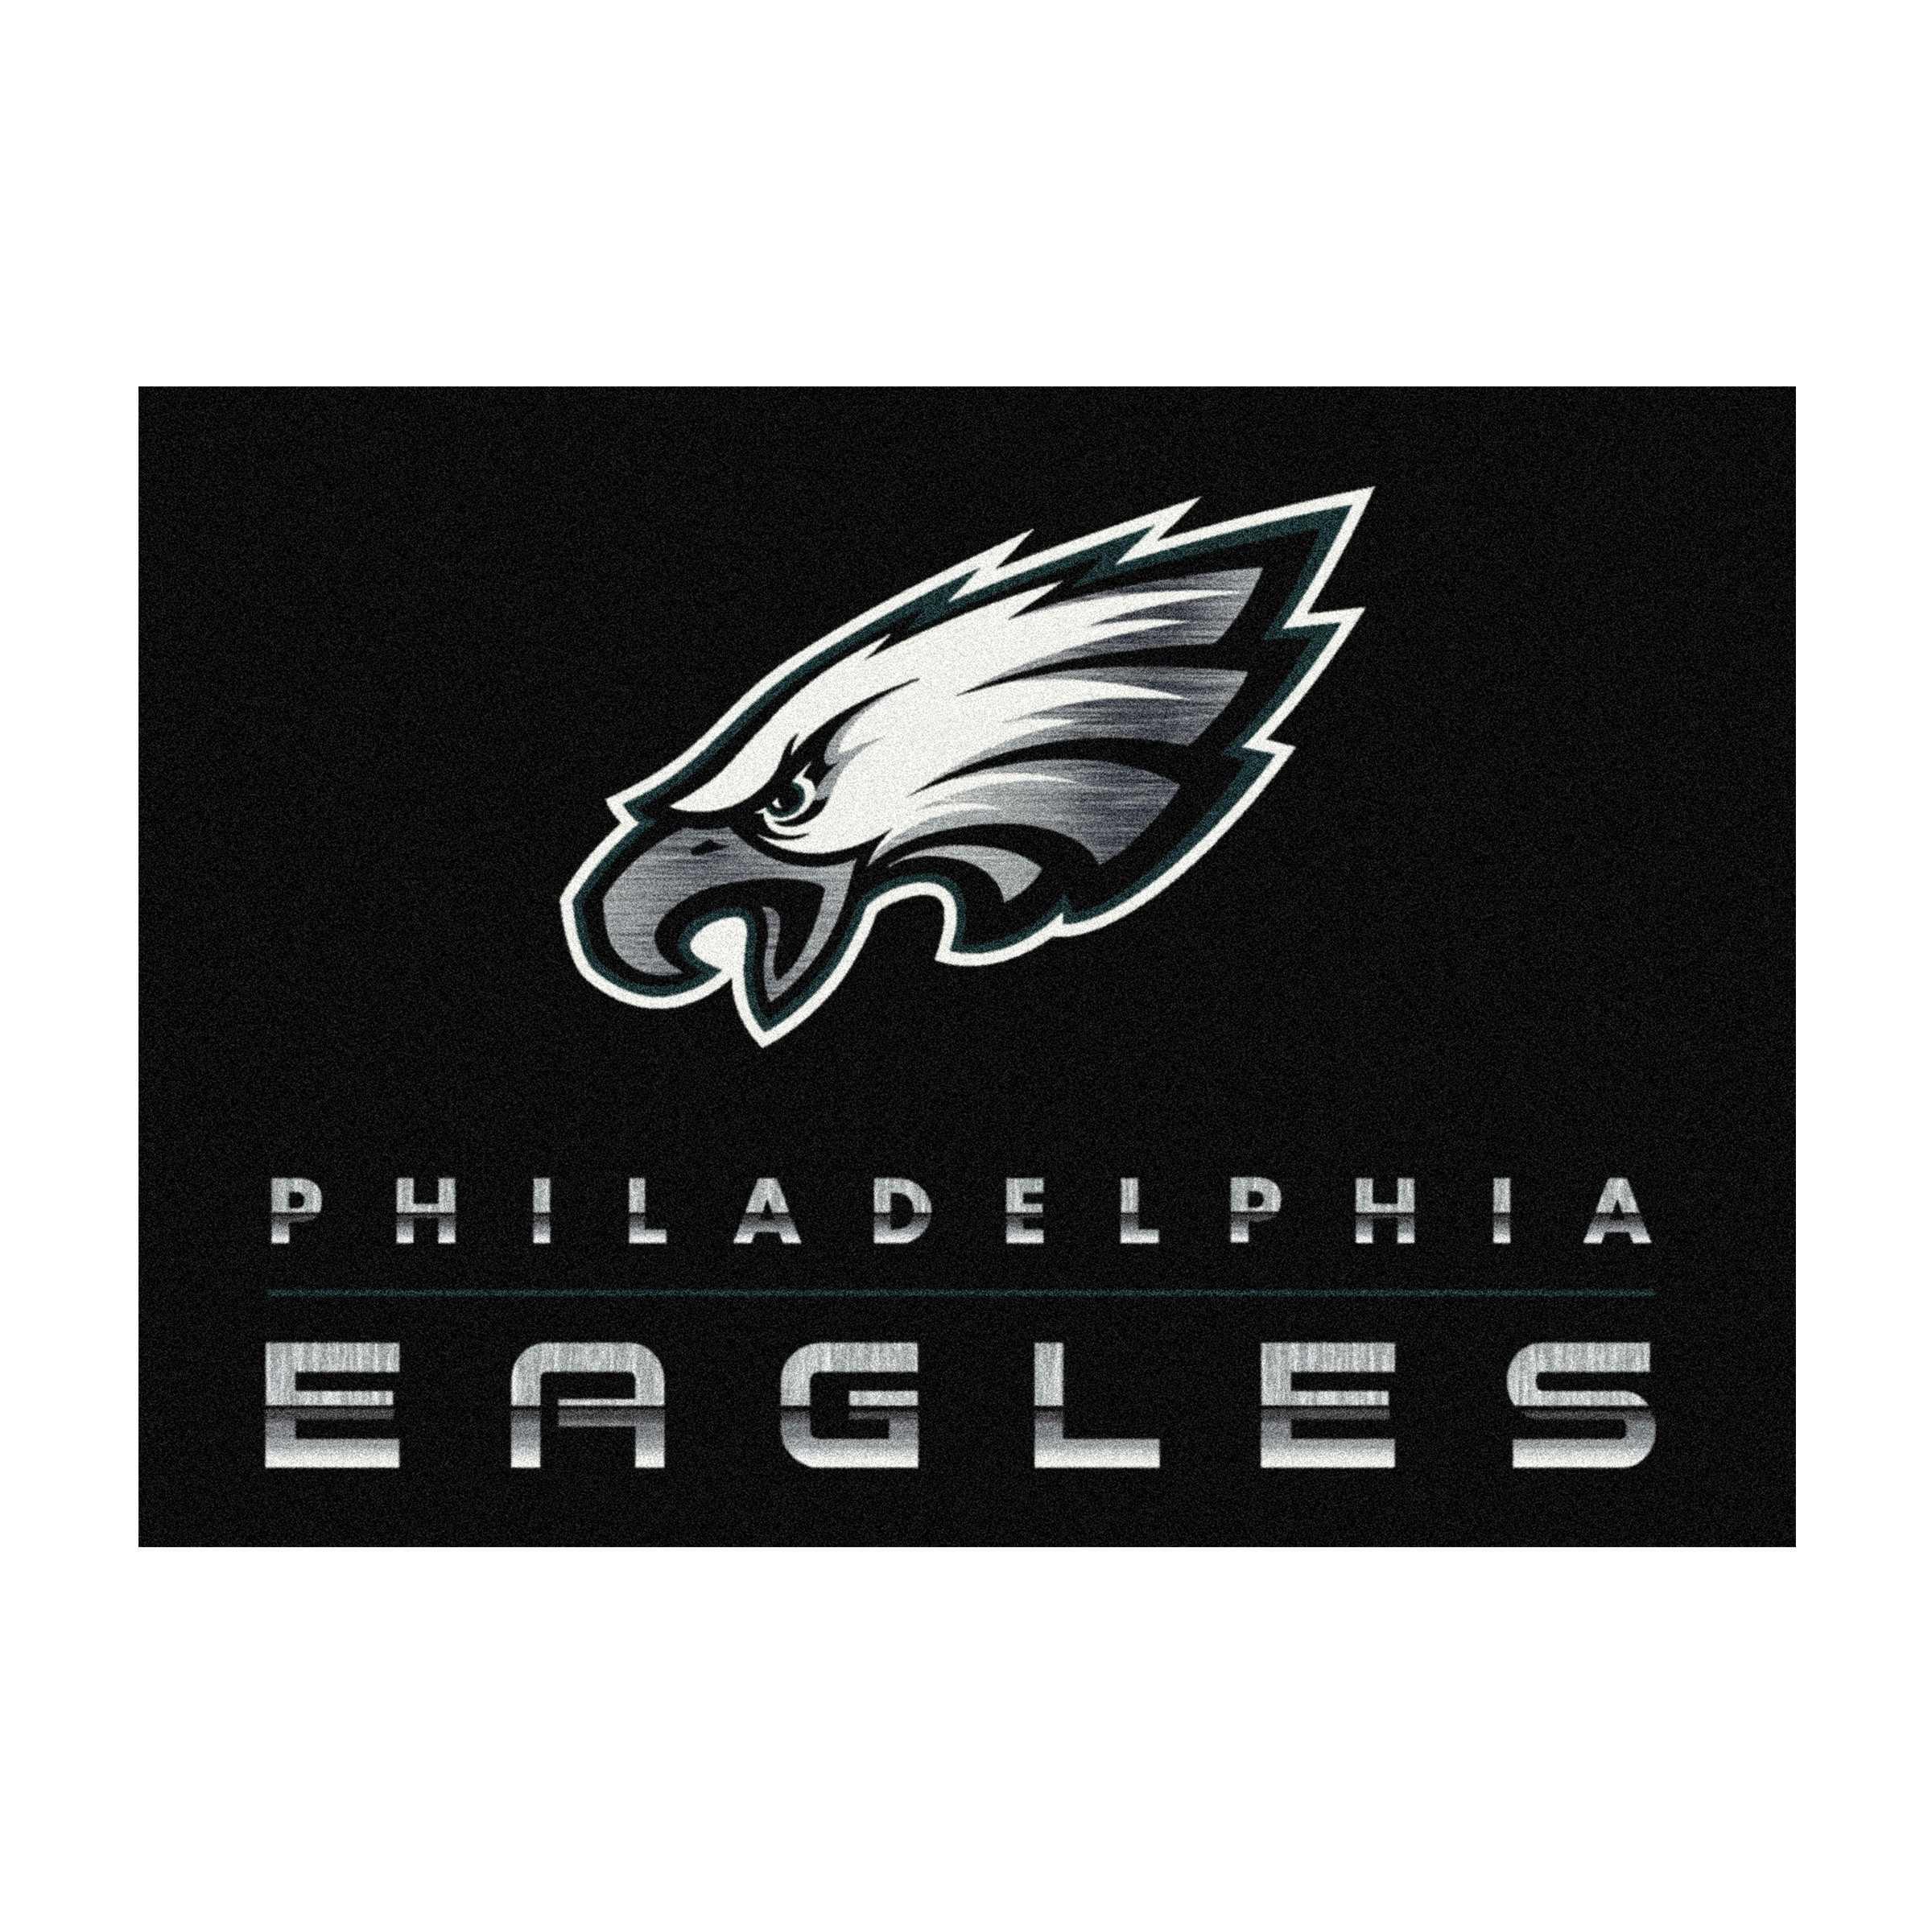 PHILADELPHIA EAGLES 6X8 CHROME RUG